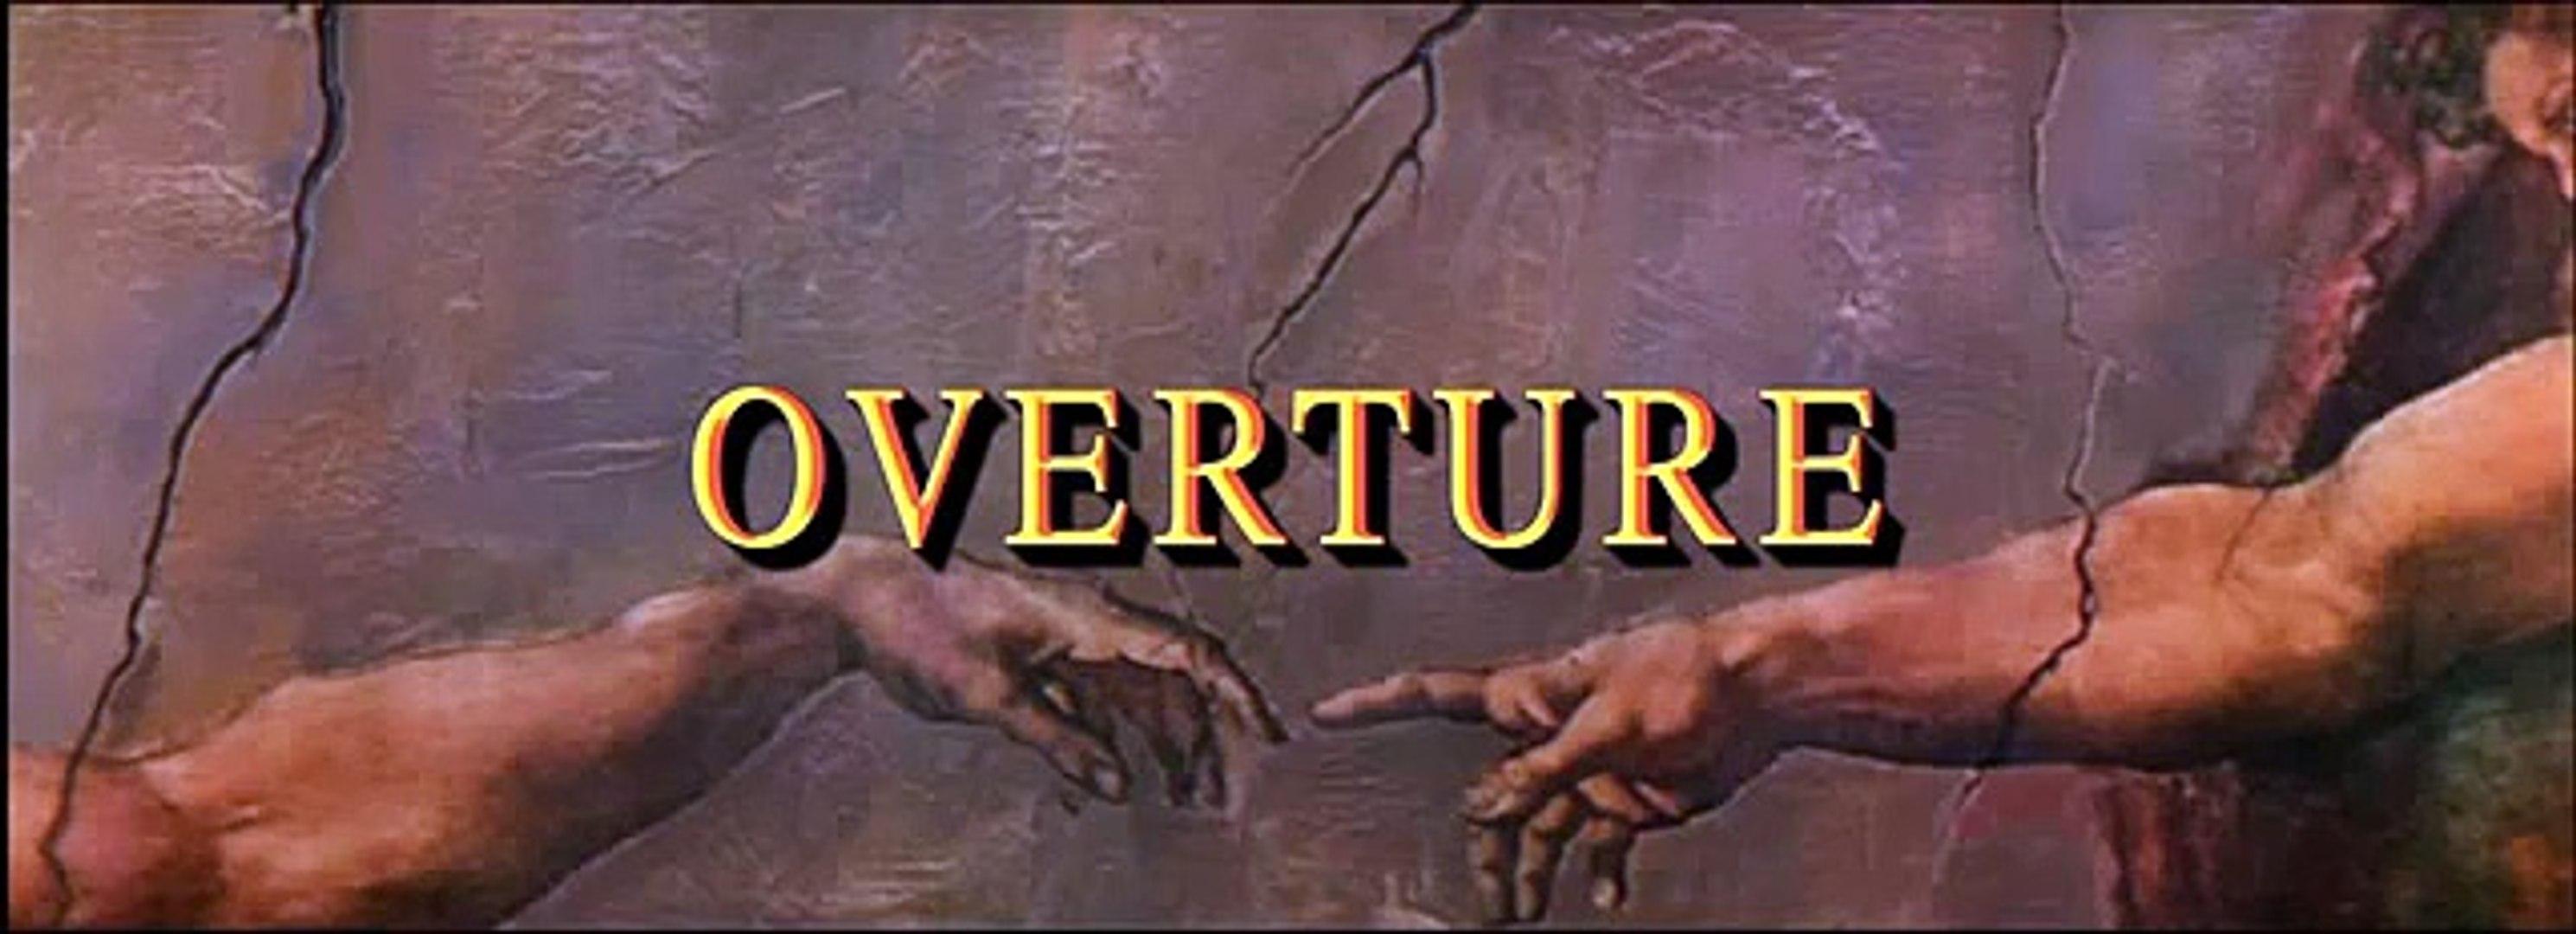 Ben Hur(1959) - OVERTURE - video dailymotion